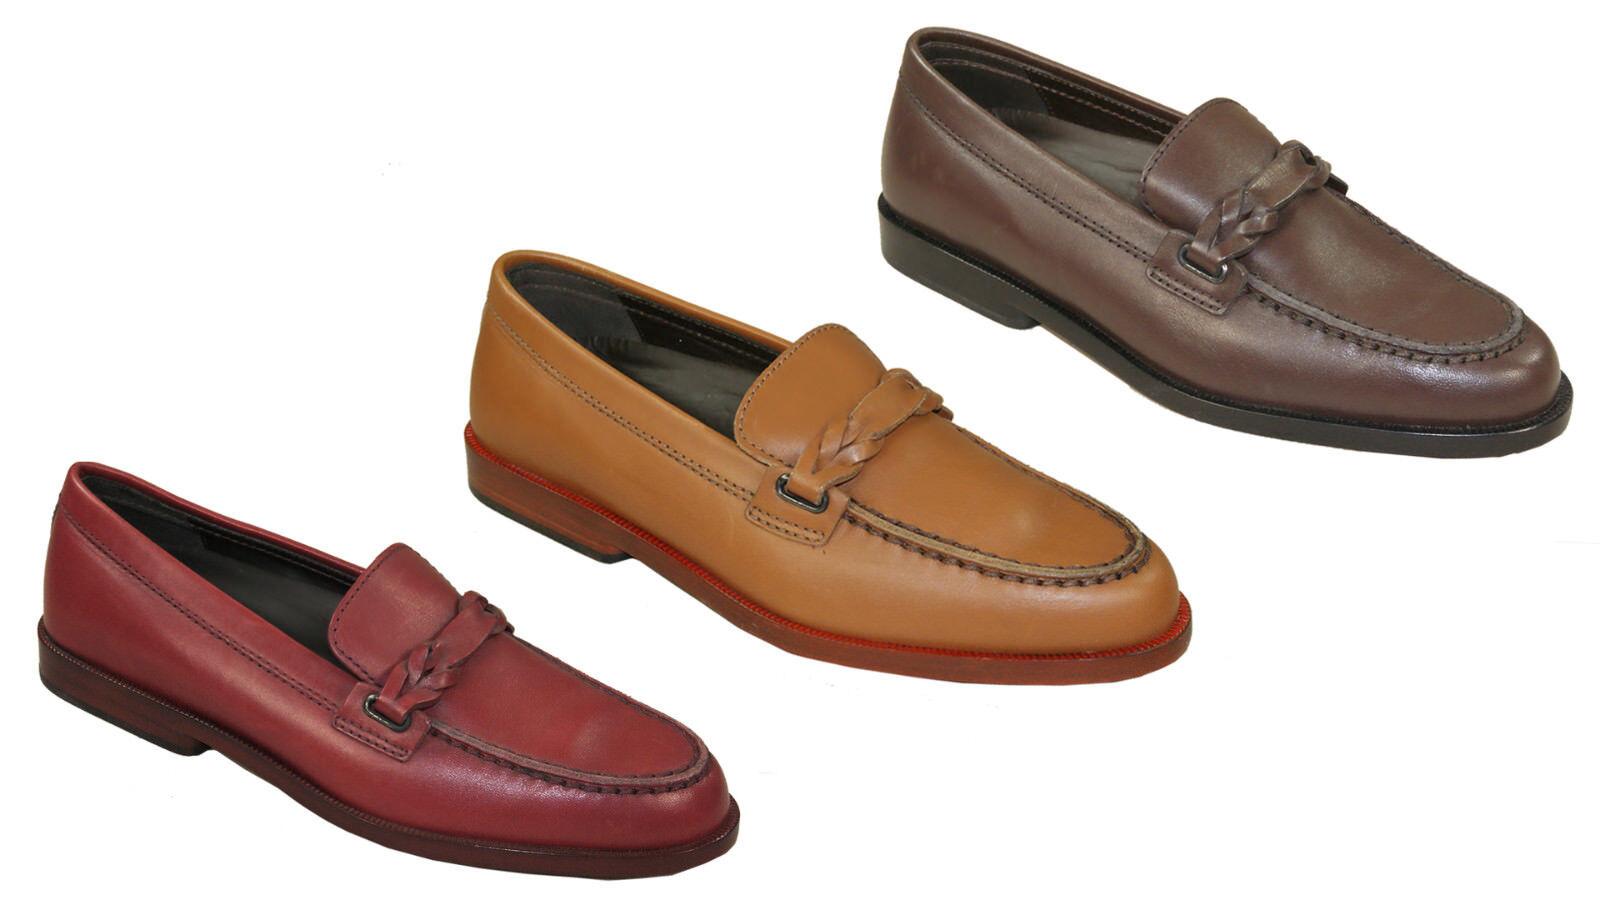 HOGAN Scarpe loafer slipper shoes Donna Scarpe Da Donna Scarpe Basse Svendita Nuovo